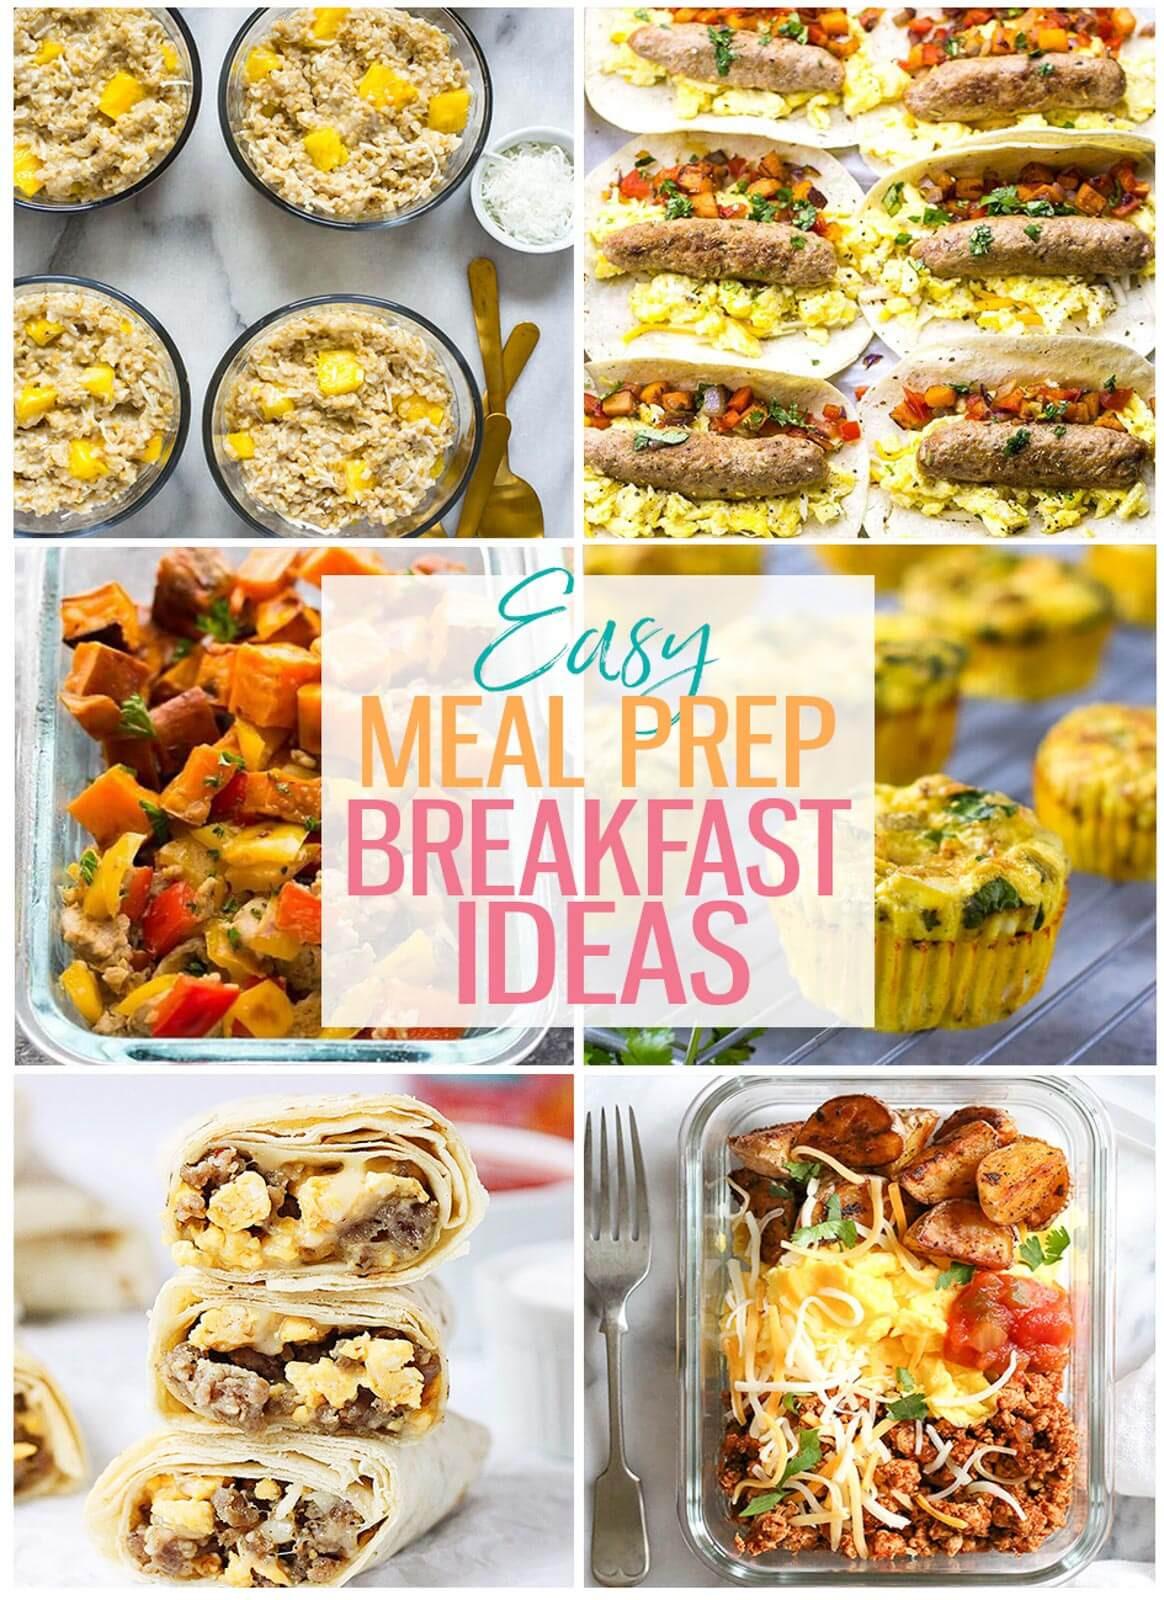 Healthy Breakfast Meal Prep Ideas  15 Breakfast Meal Prep Ideas for Busy Mornings The Girl